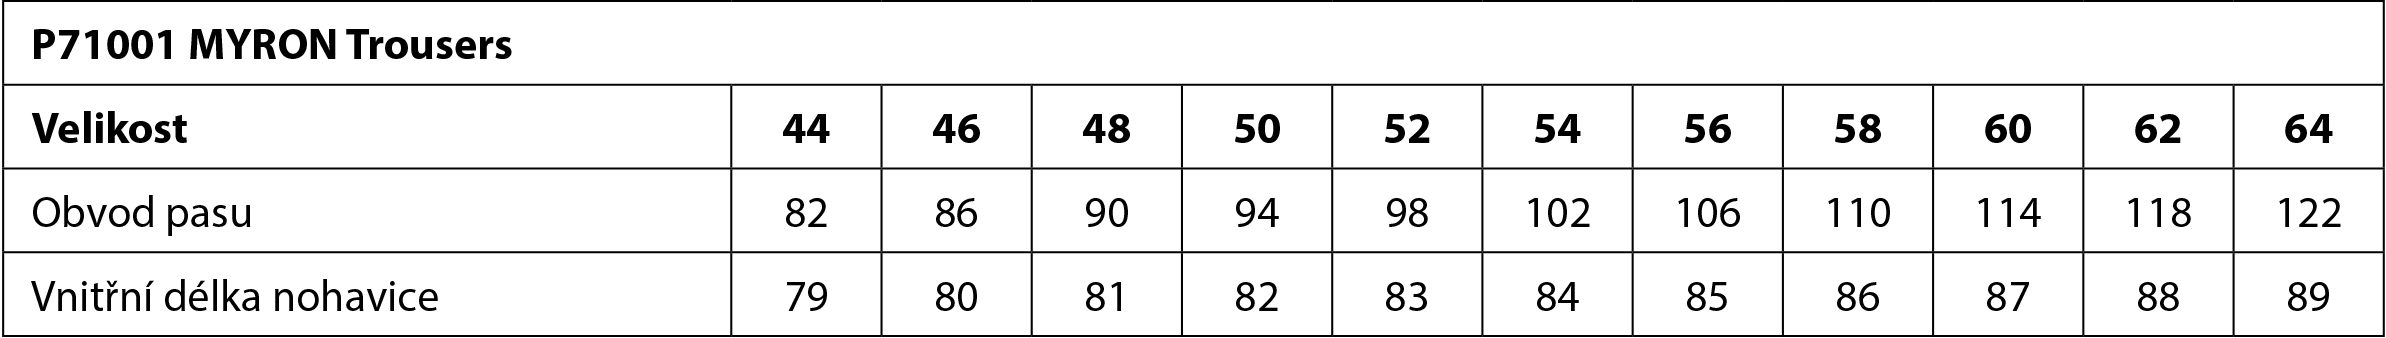 z-style_velikostni-tabulky_cz_2386x338px_myron_p710001